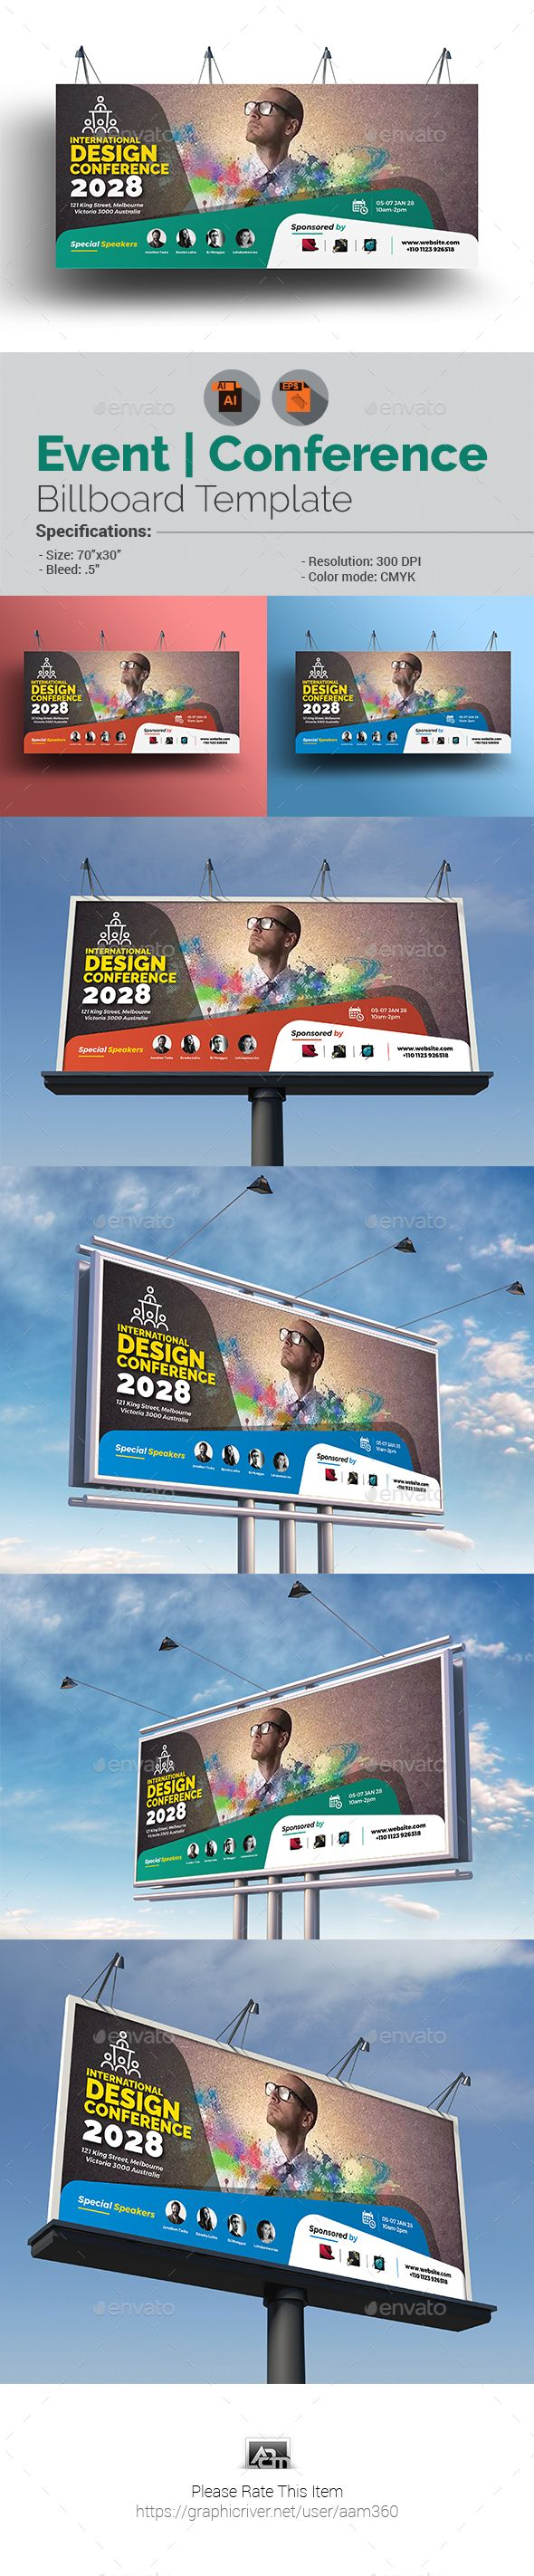 conference event billboard template vector eps ai. Black Bedroom Furniture Sets. Home Design Ideas